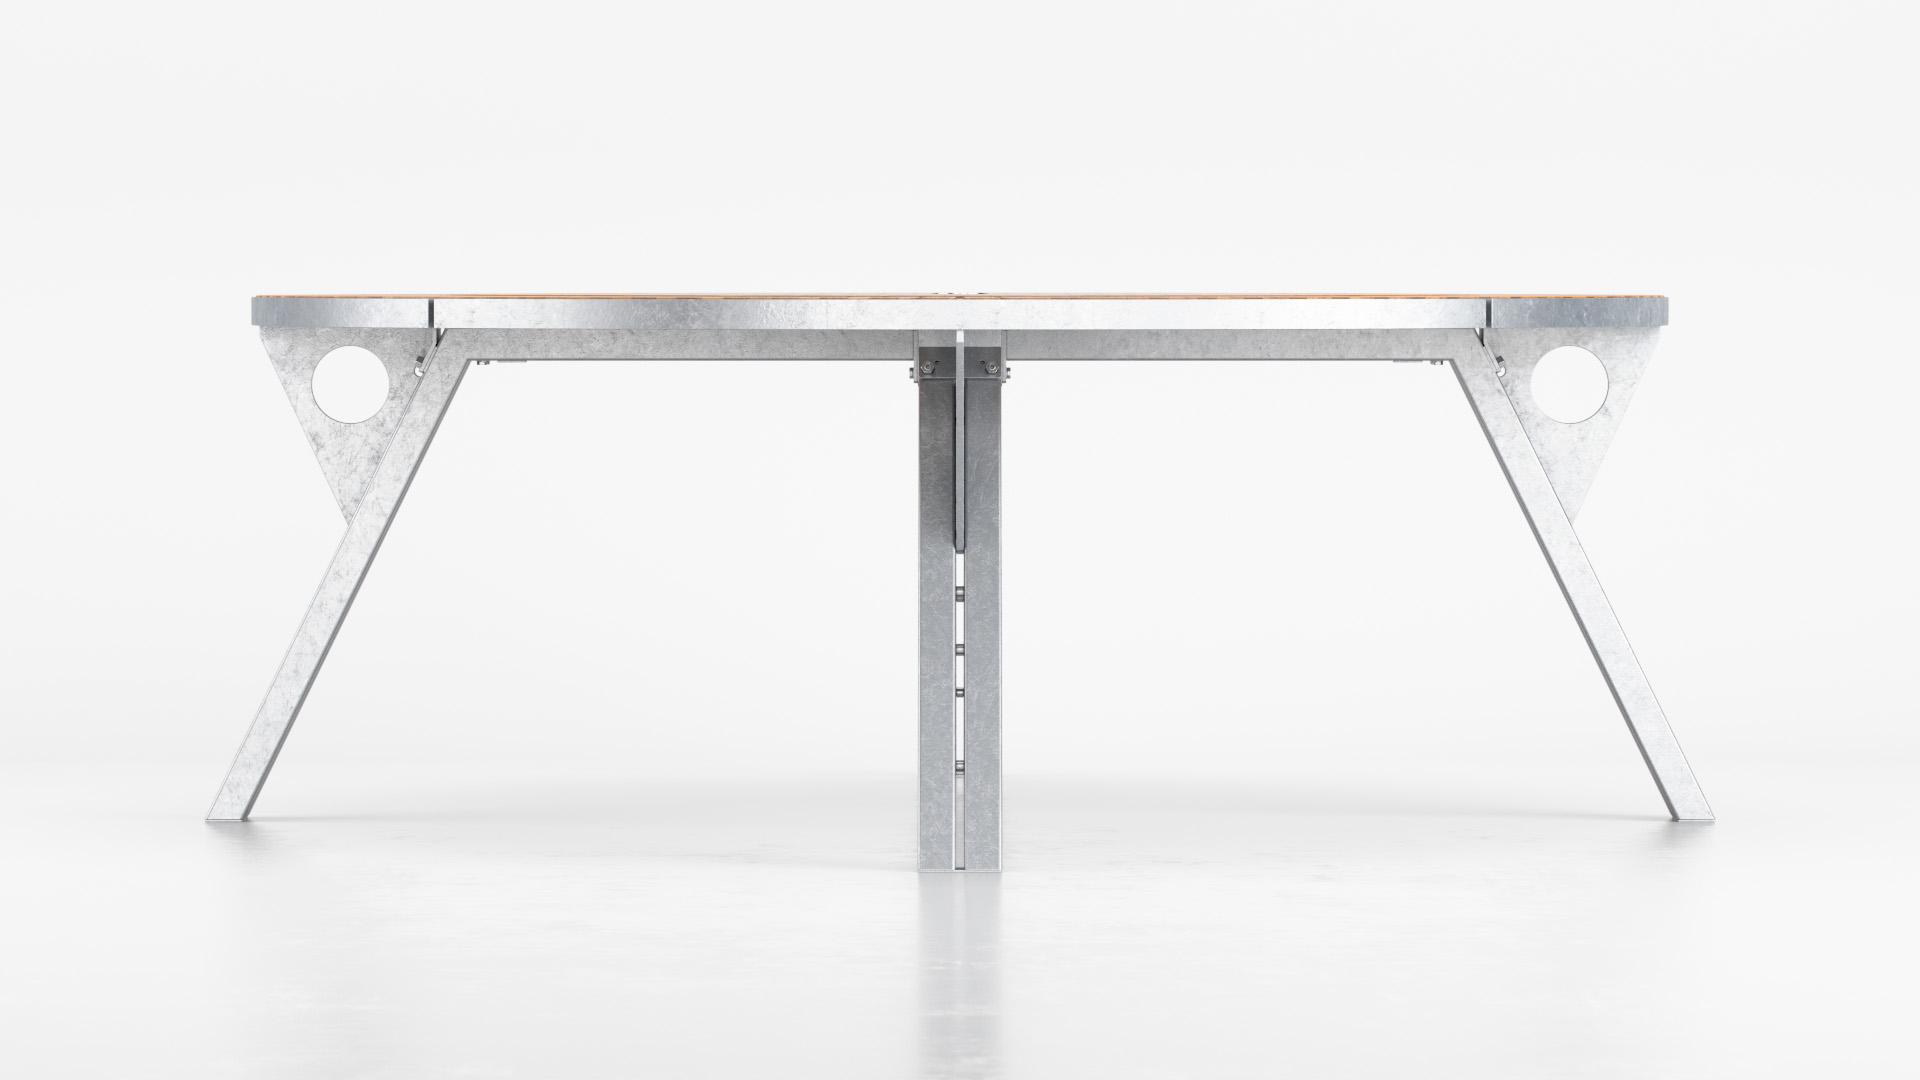 Gargantua_Table_Mode2_WhiteSet_01_0001